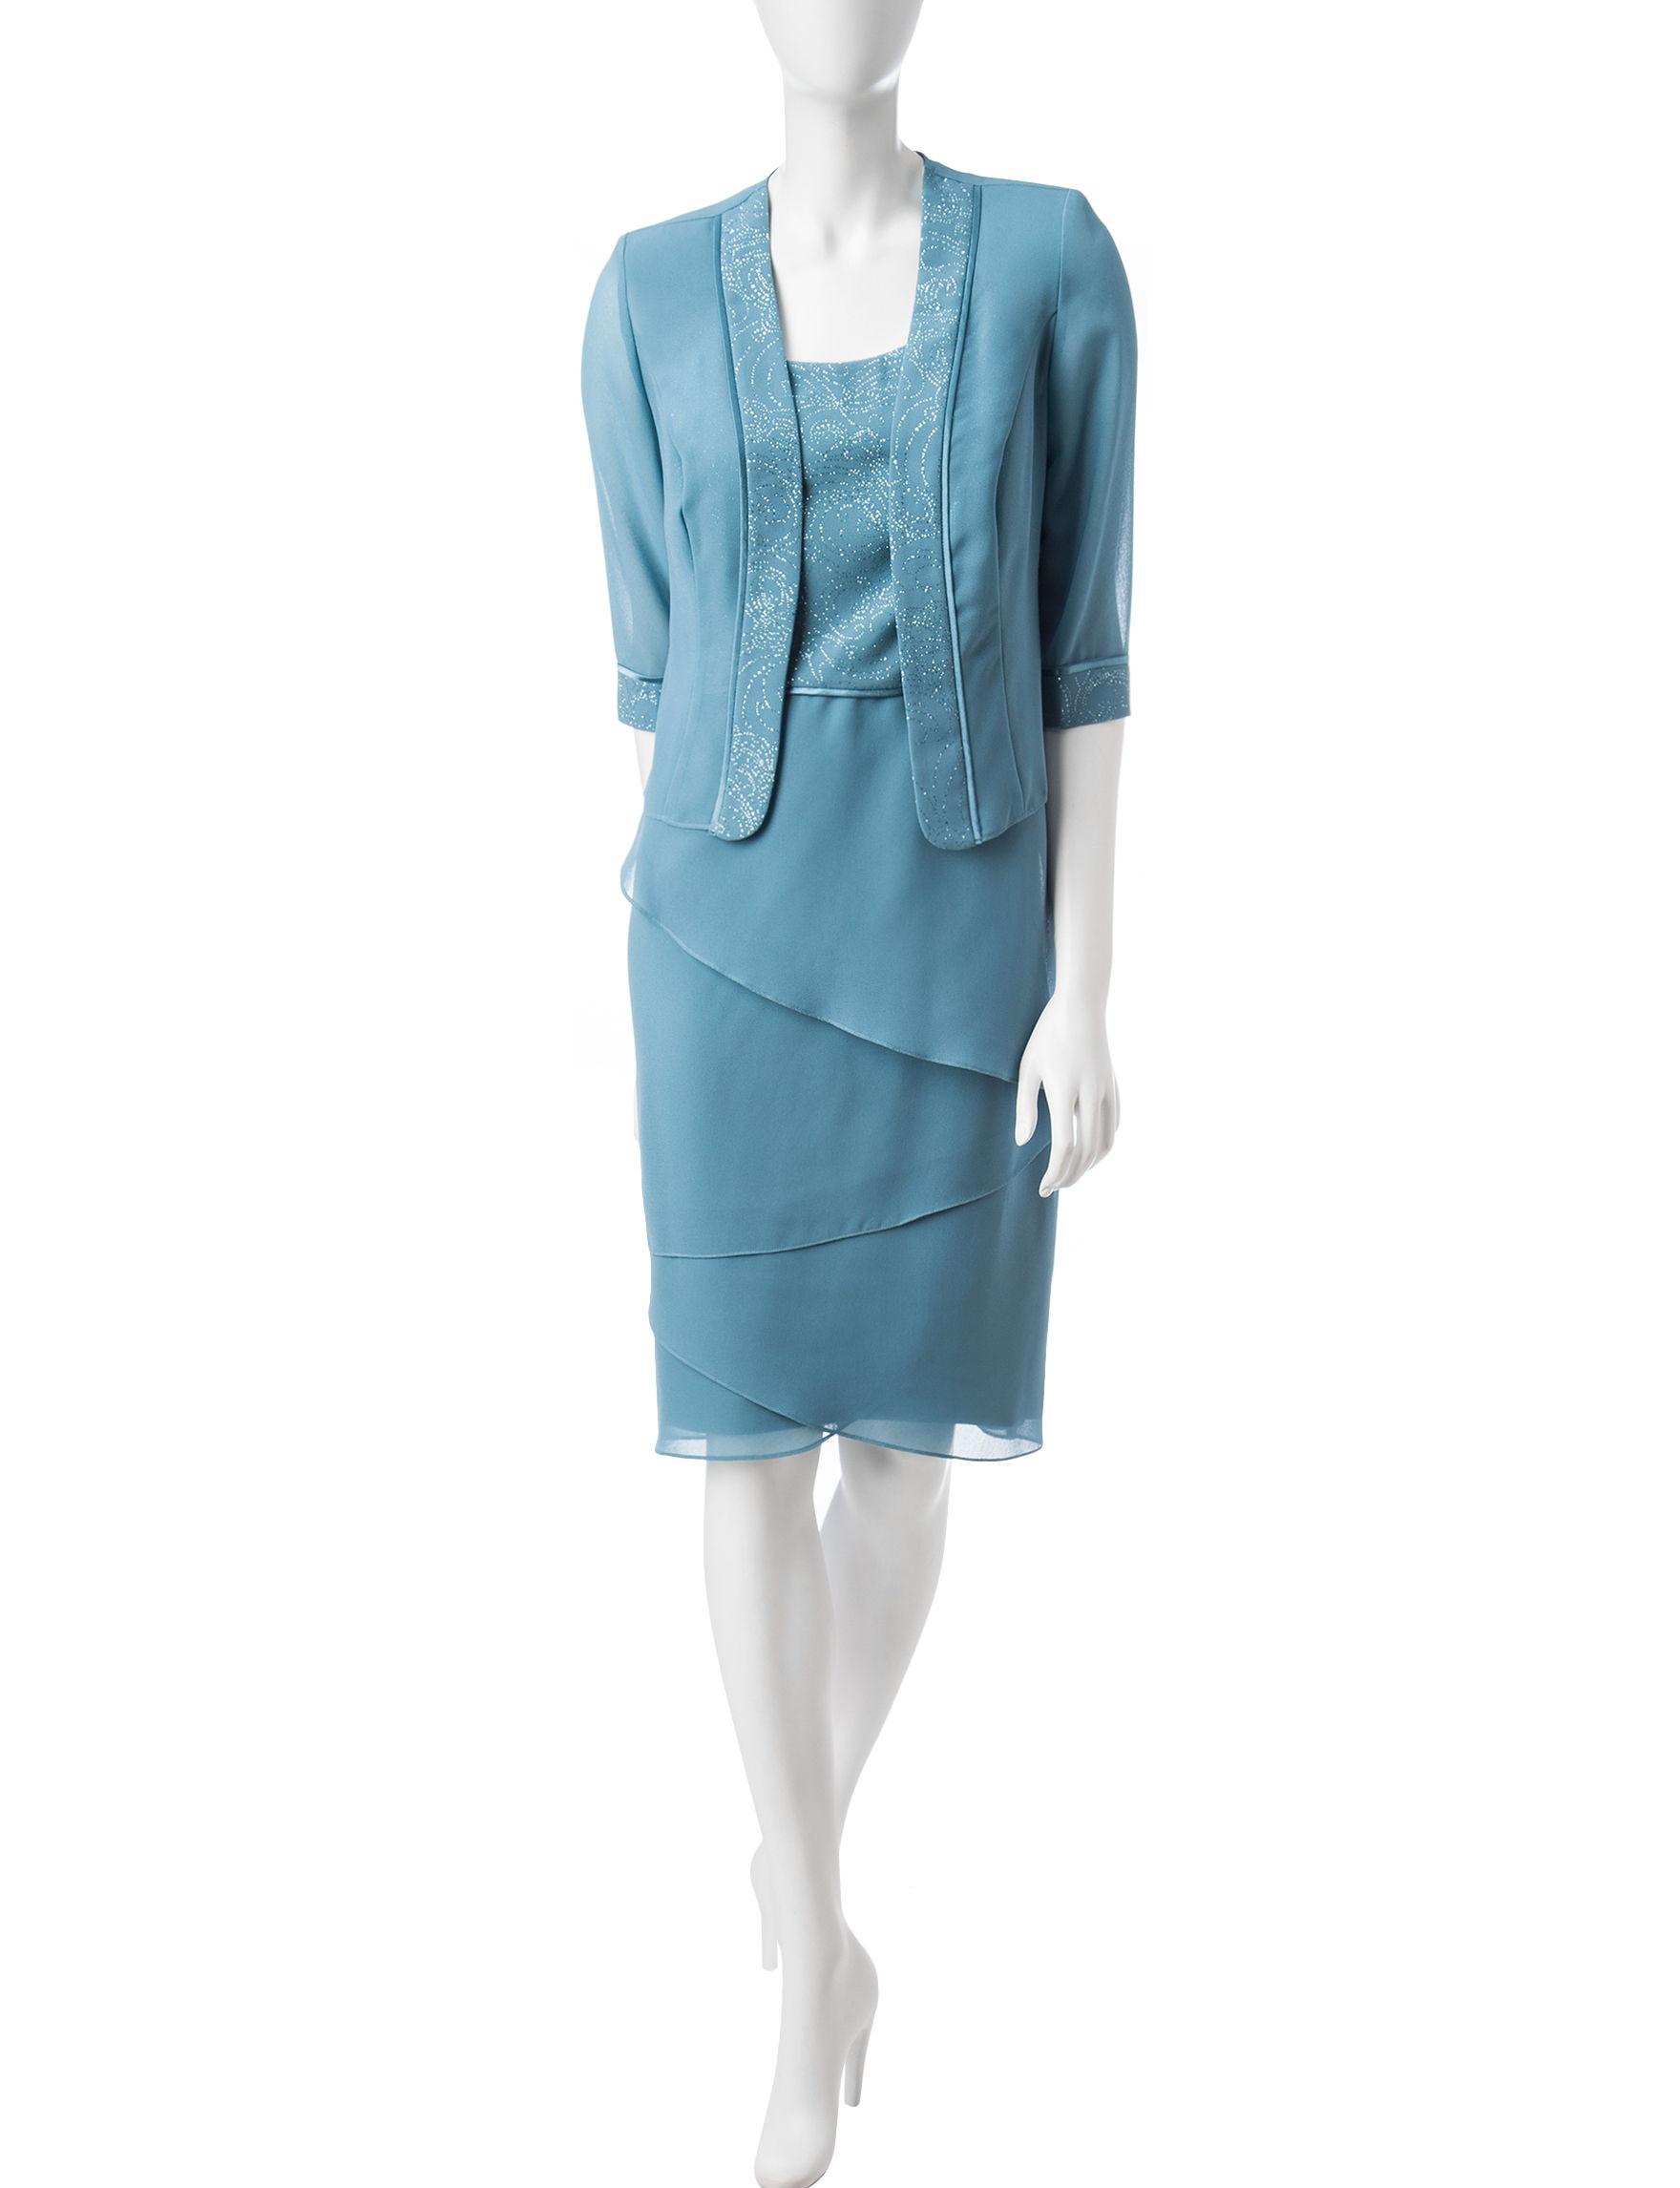 Dana Kay Blue Evening & Formal Jacket Dresses